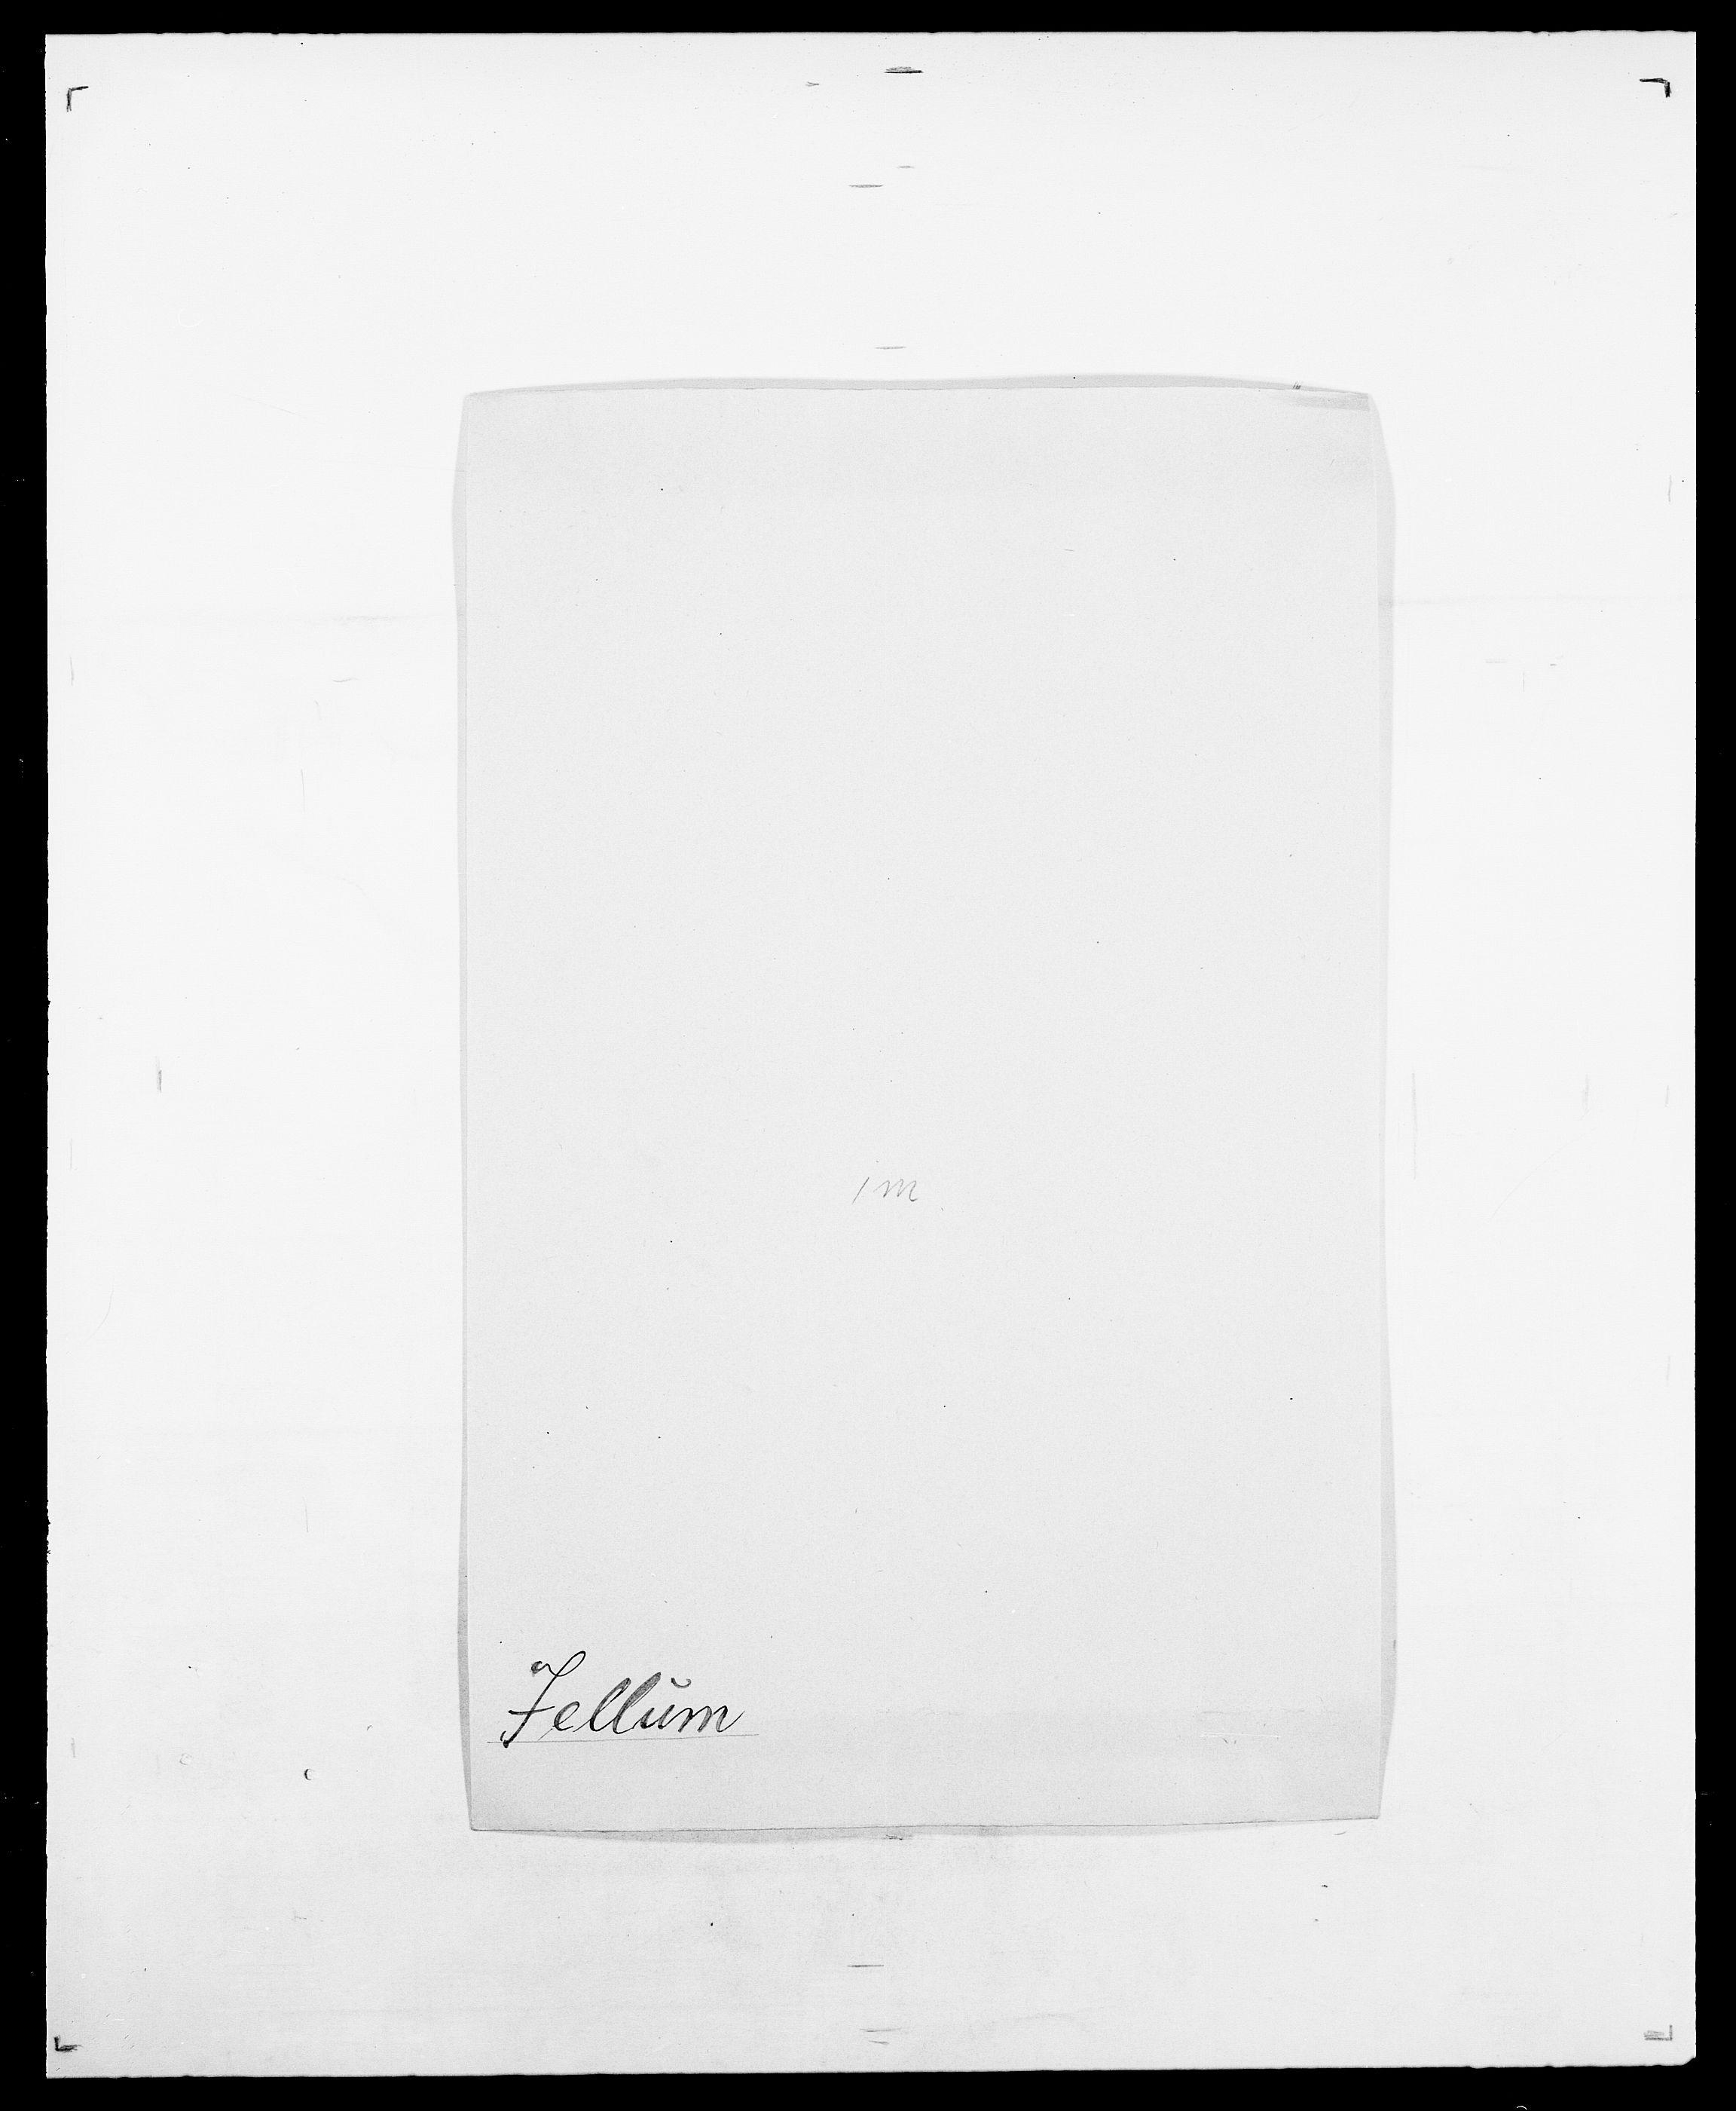 SAO, Delgobe, Charles Antoine - samling, D/Da/L0019: van der Hude - Joys, s. 626